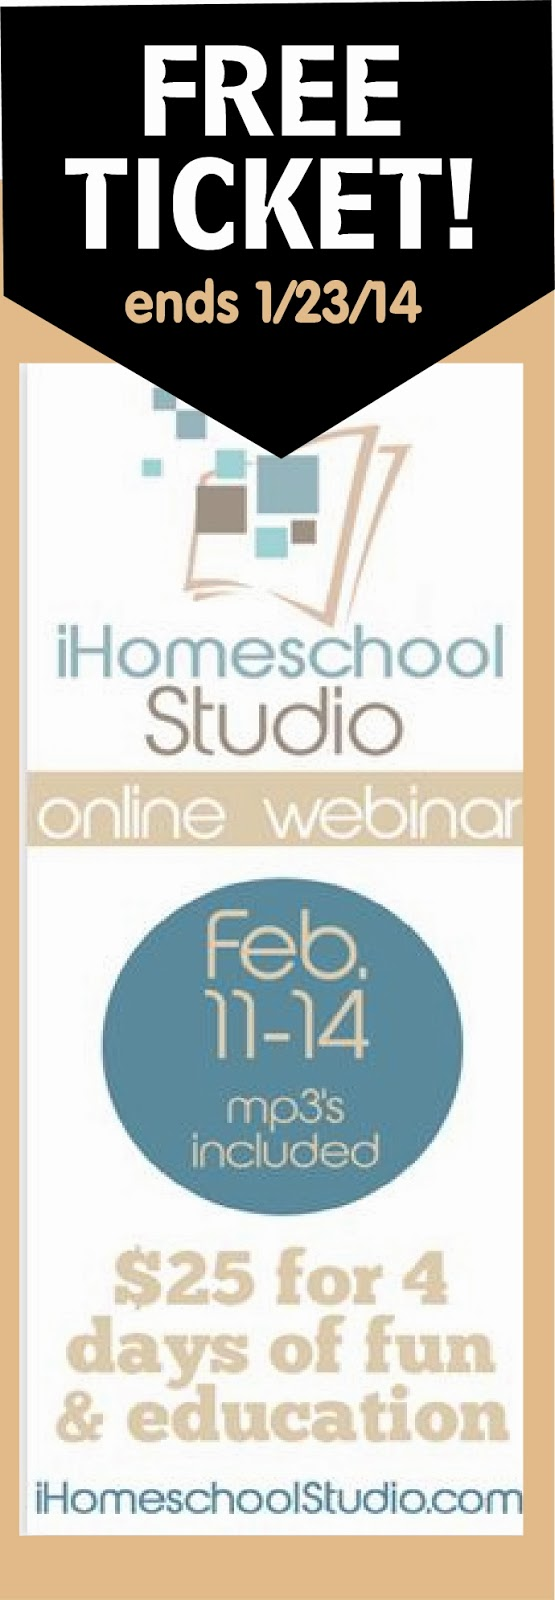 iHomeschool Studio homeschool webinar Feb 11-14, 2014